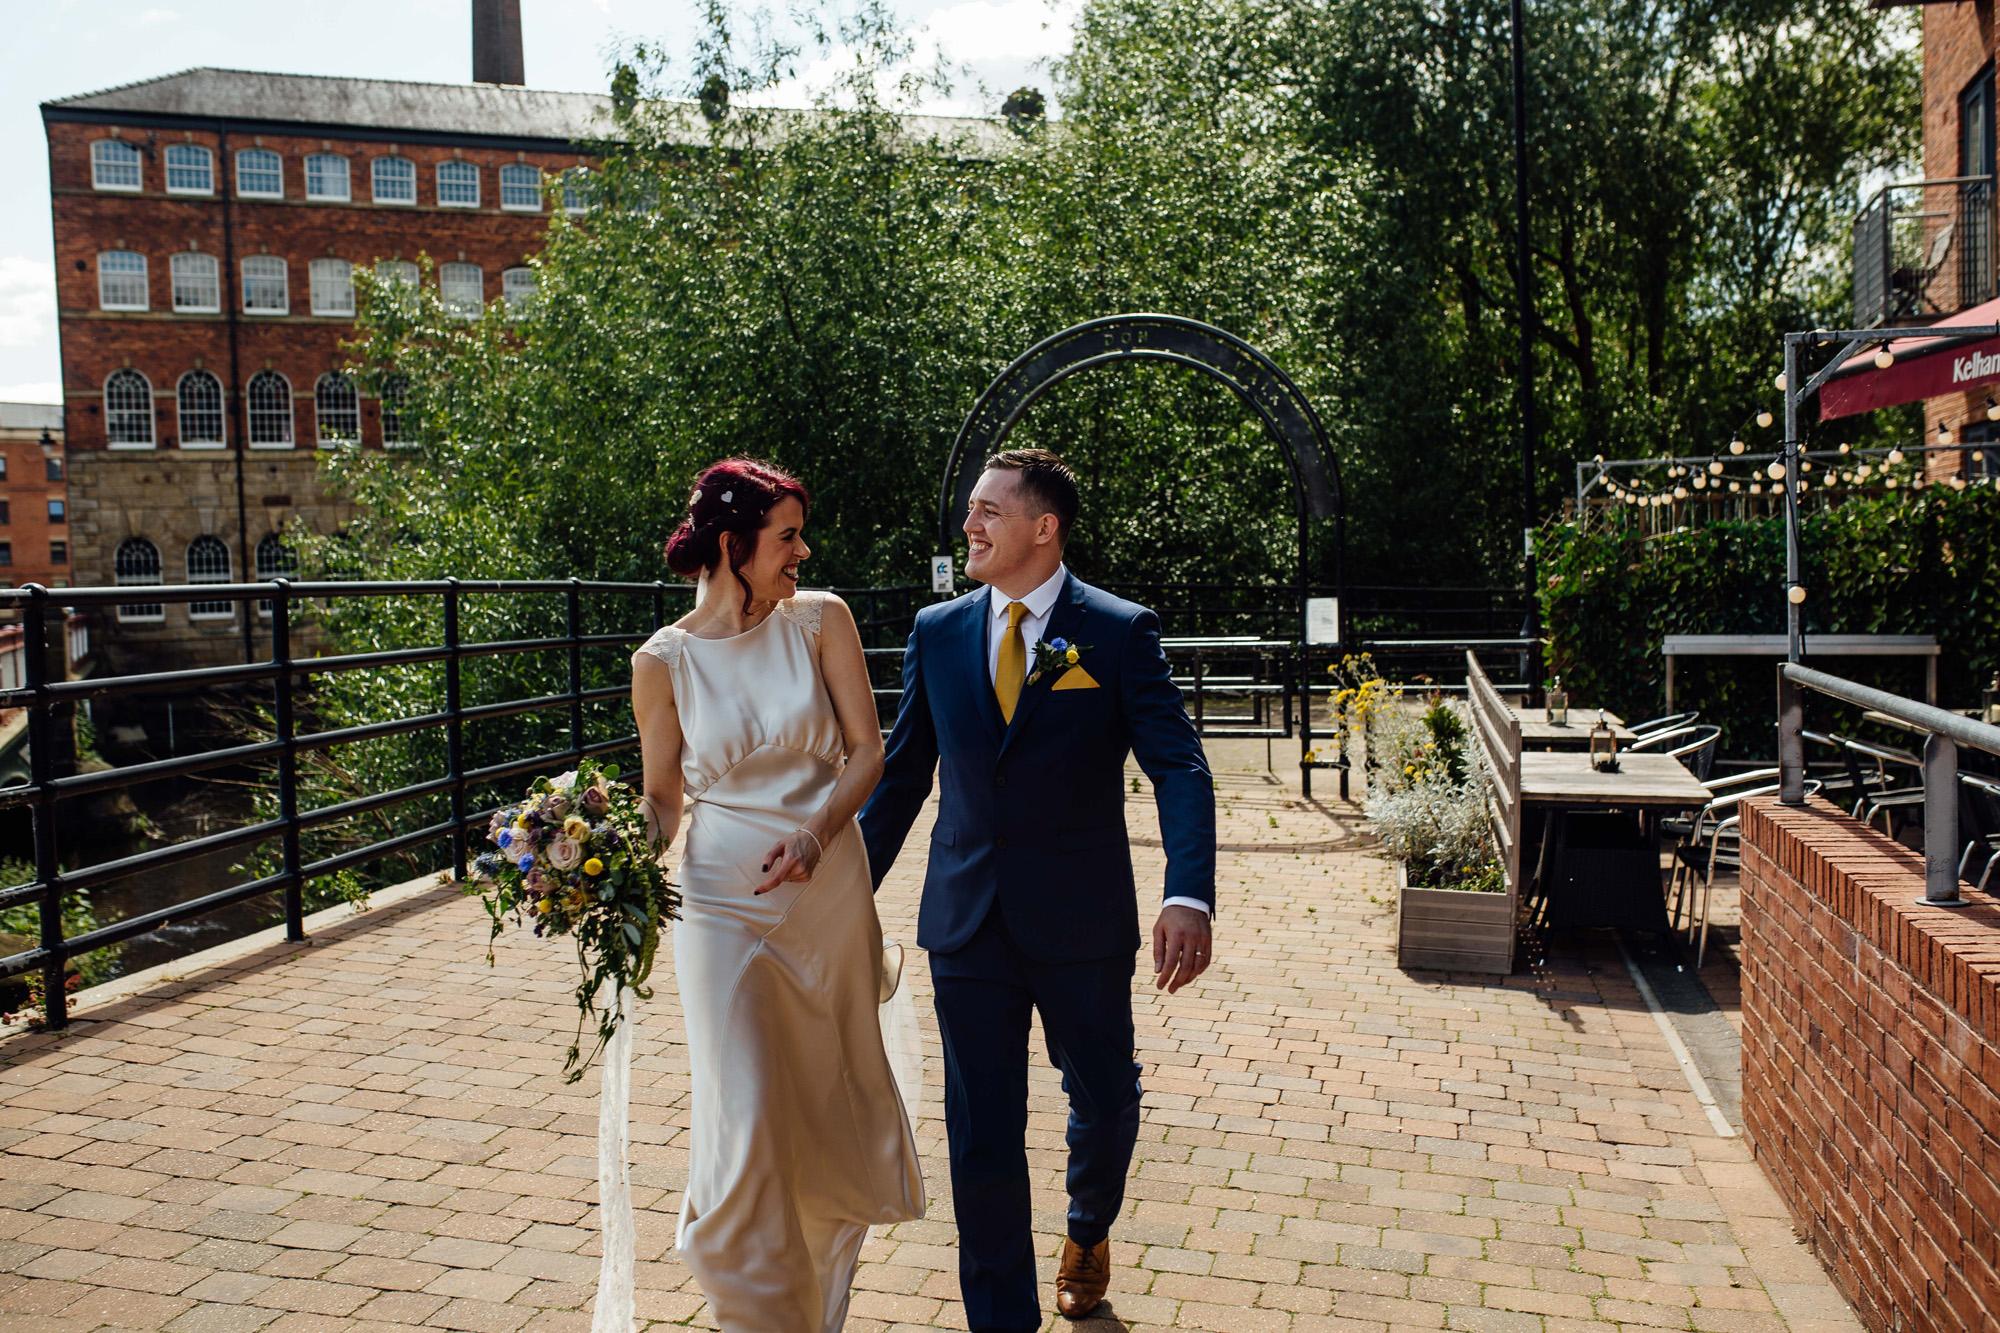 Sarah-Honeysuckle-Bias-Cut-Silk-Vintage-Inspired-Wedding-Gown-Sheffield-Wedding-Kate-Beaumont-35.jpg